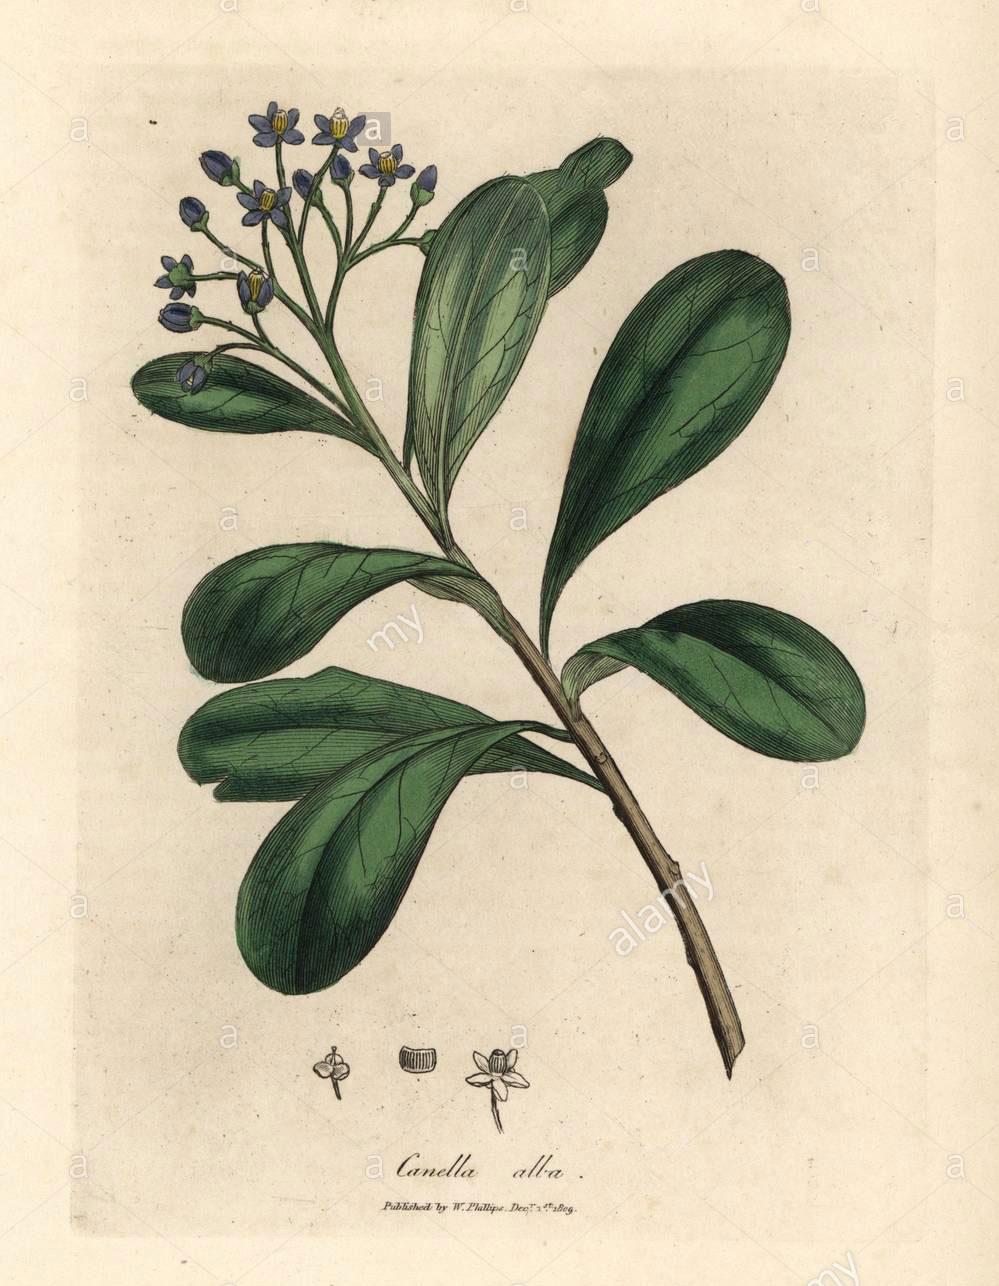 Plant-Illustration-of-Canella